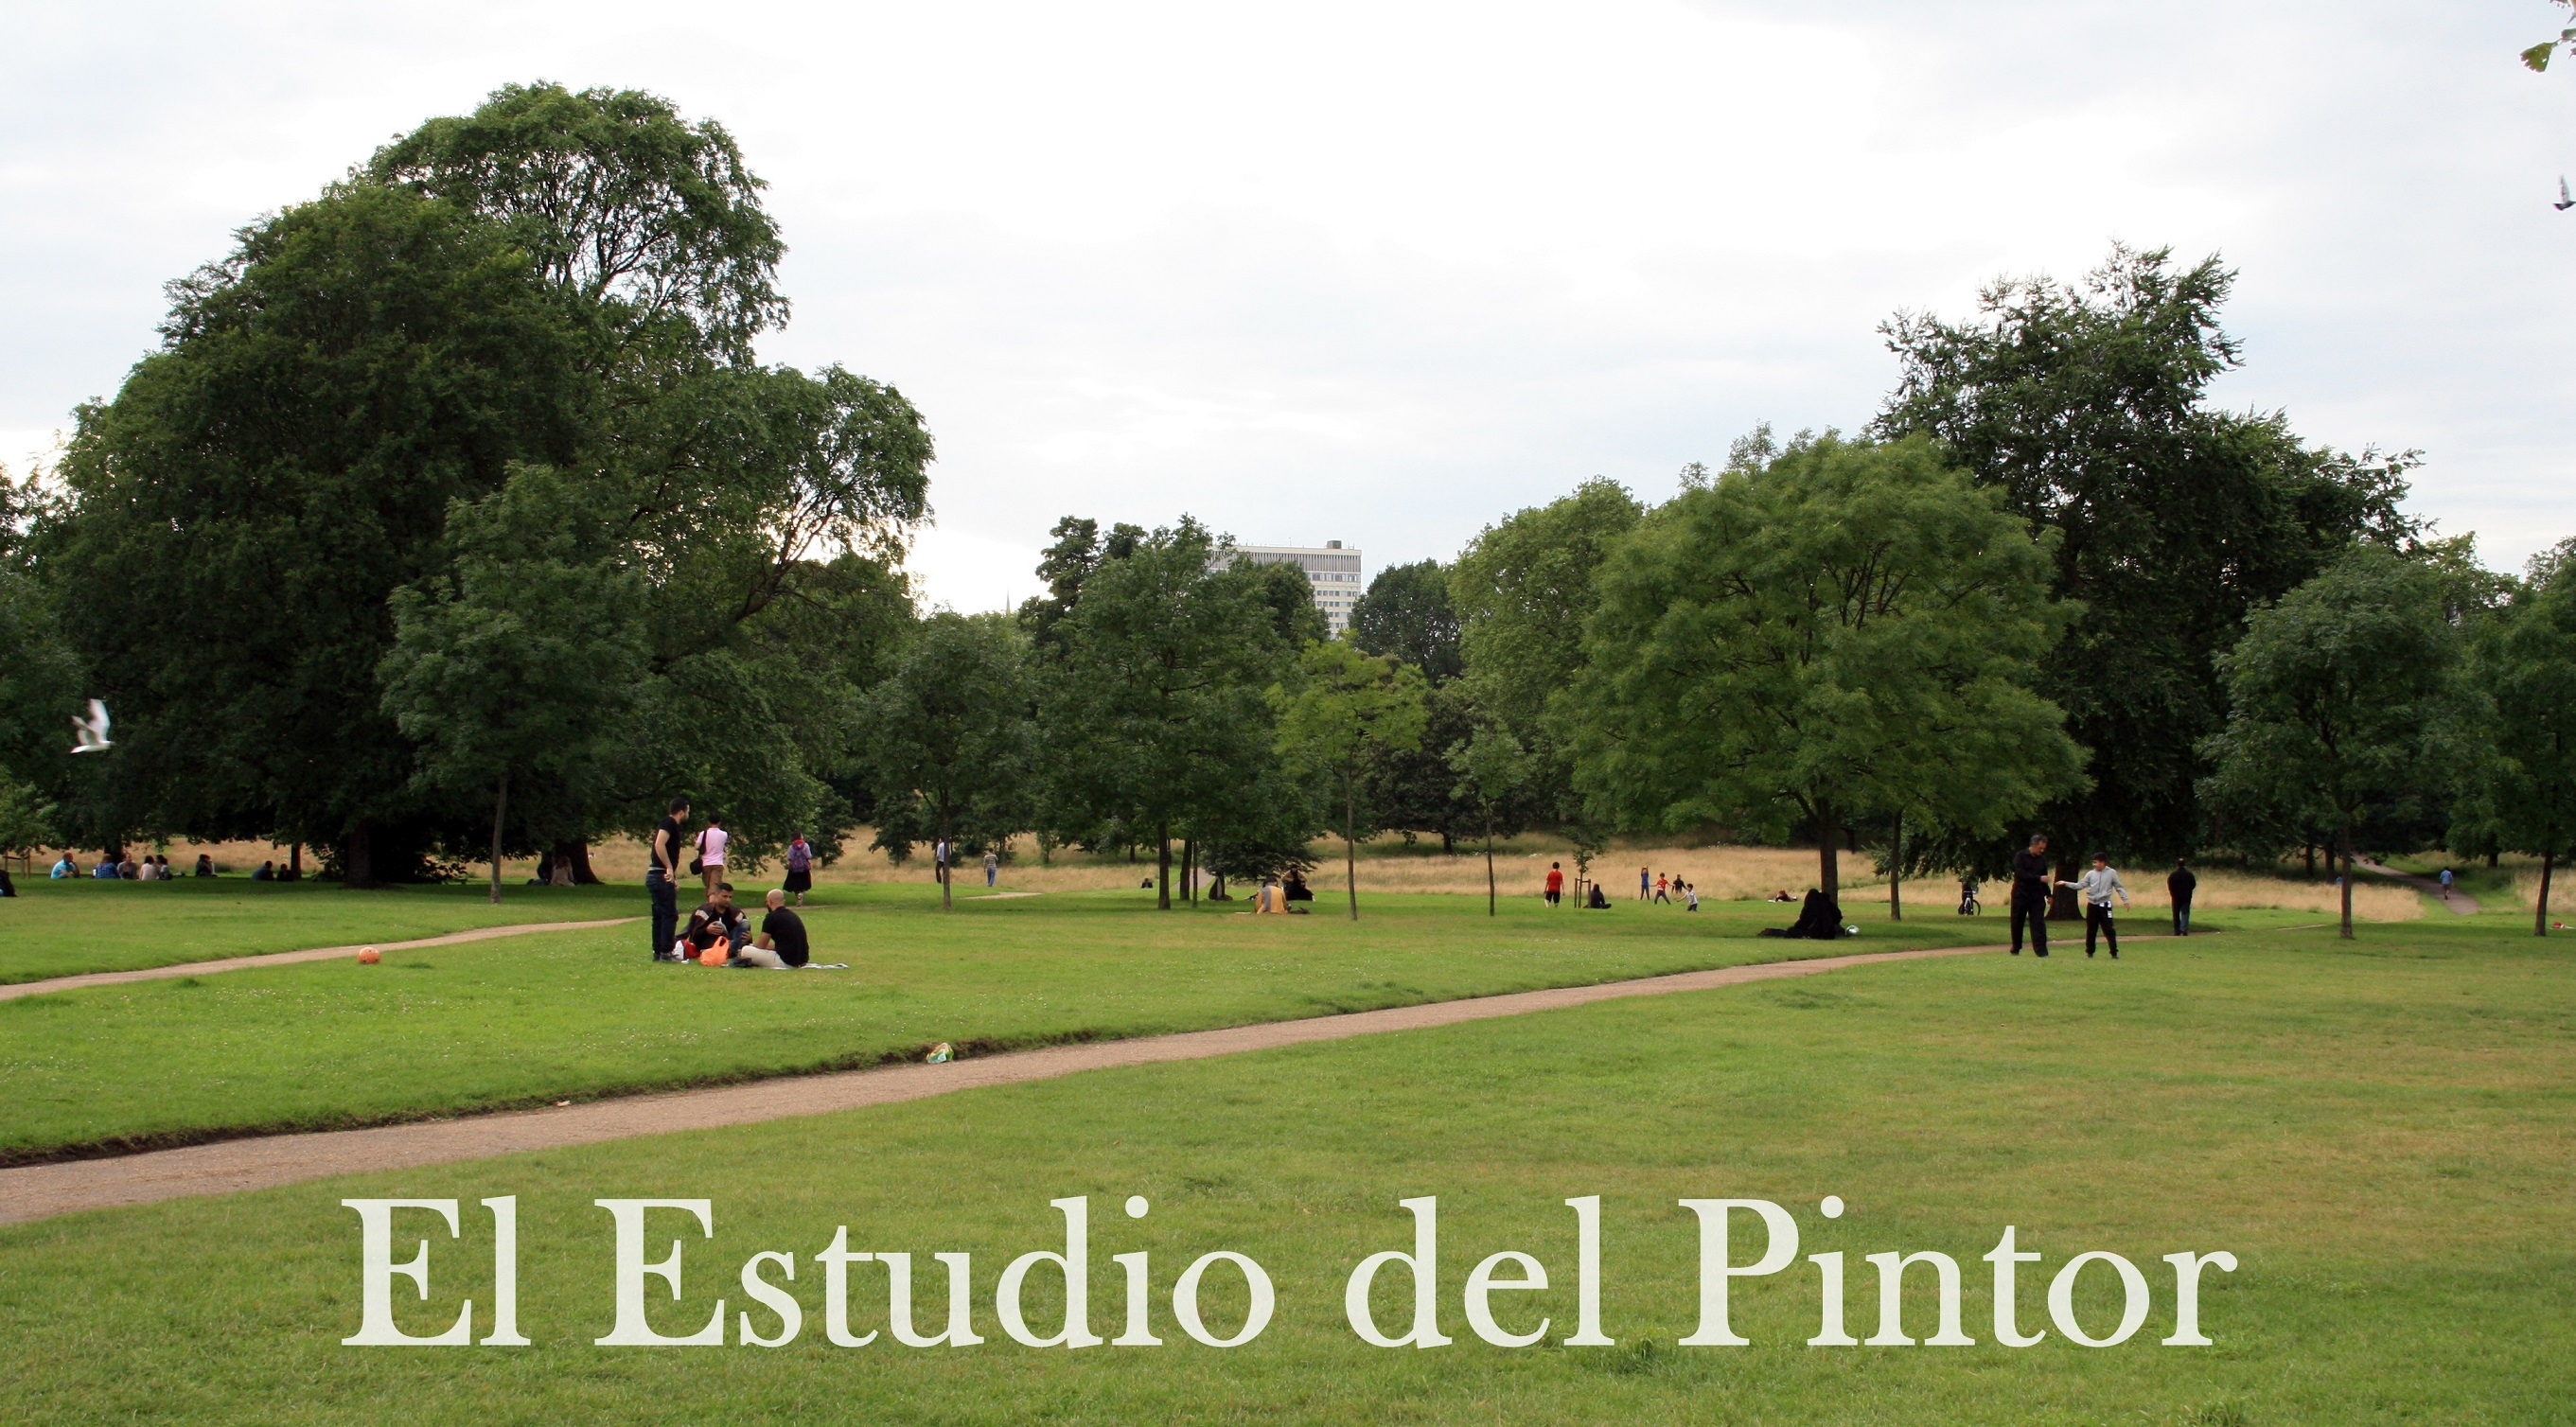 17. Green Park